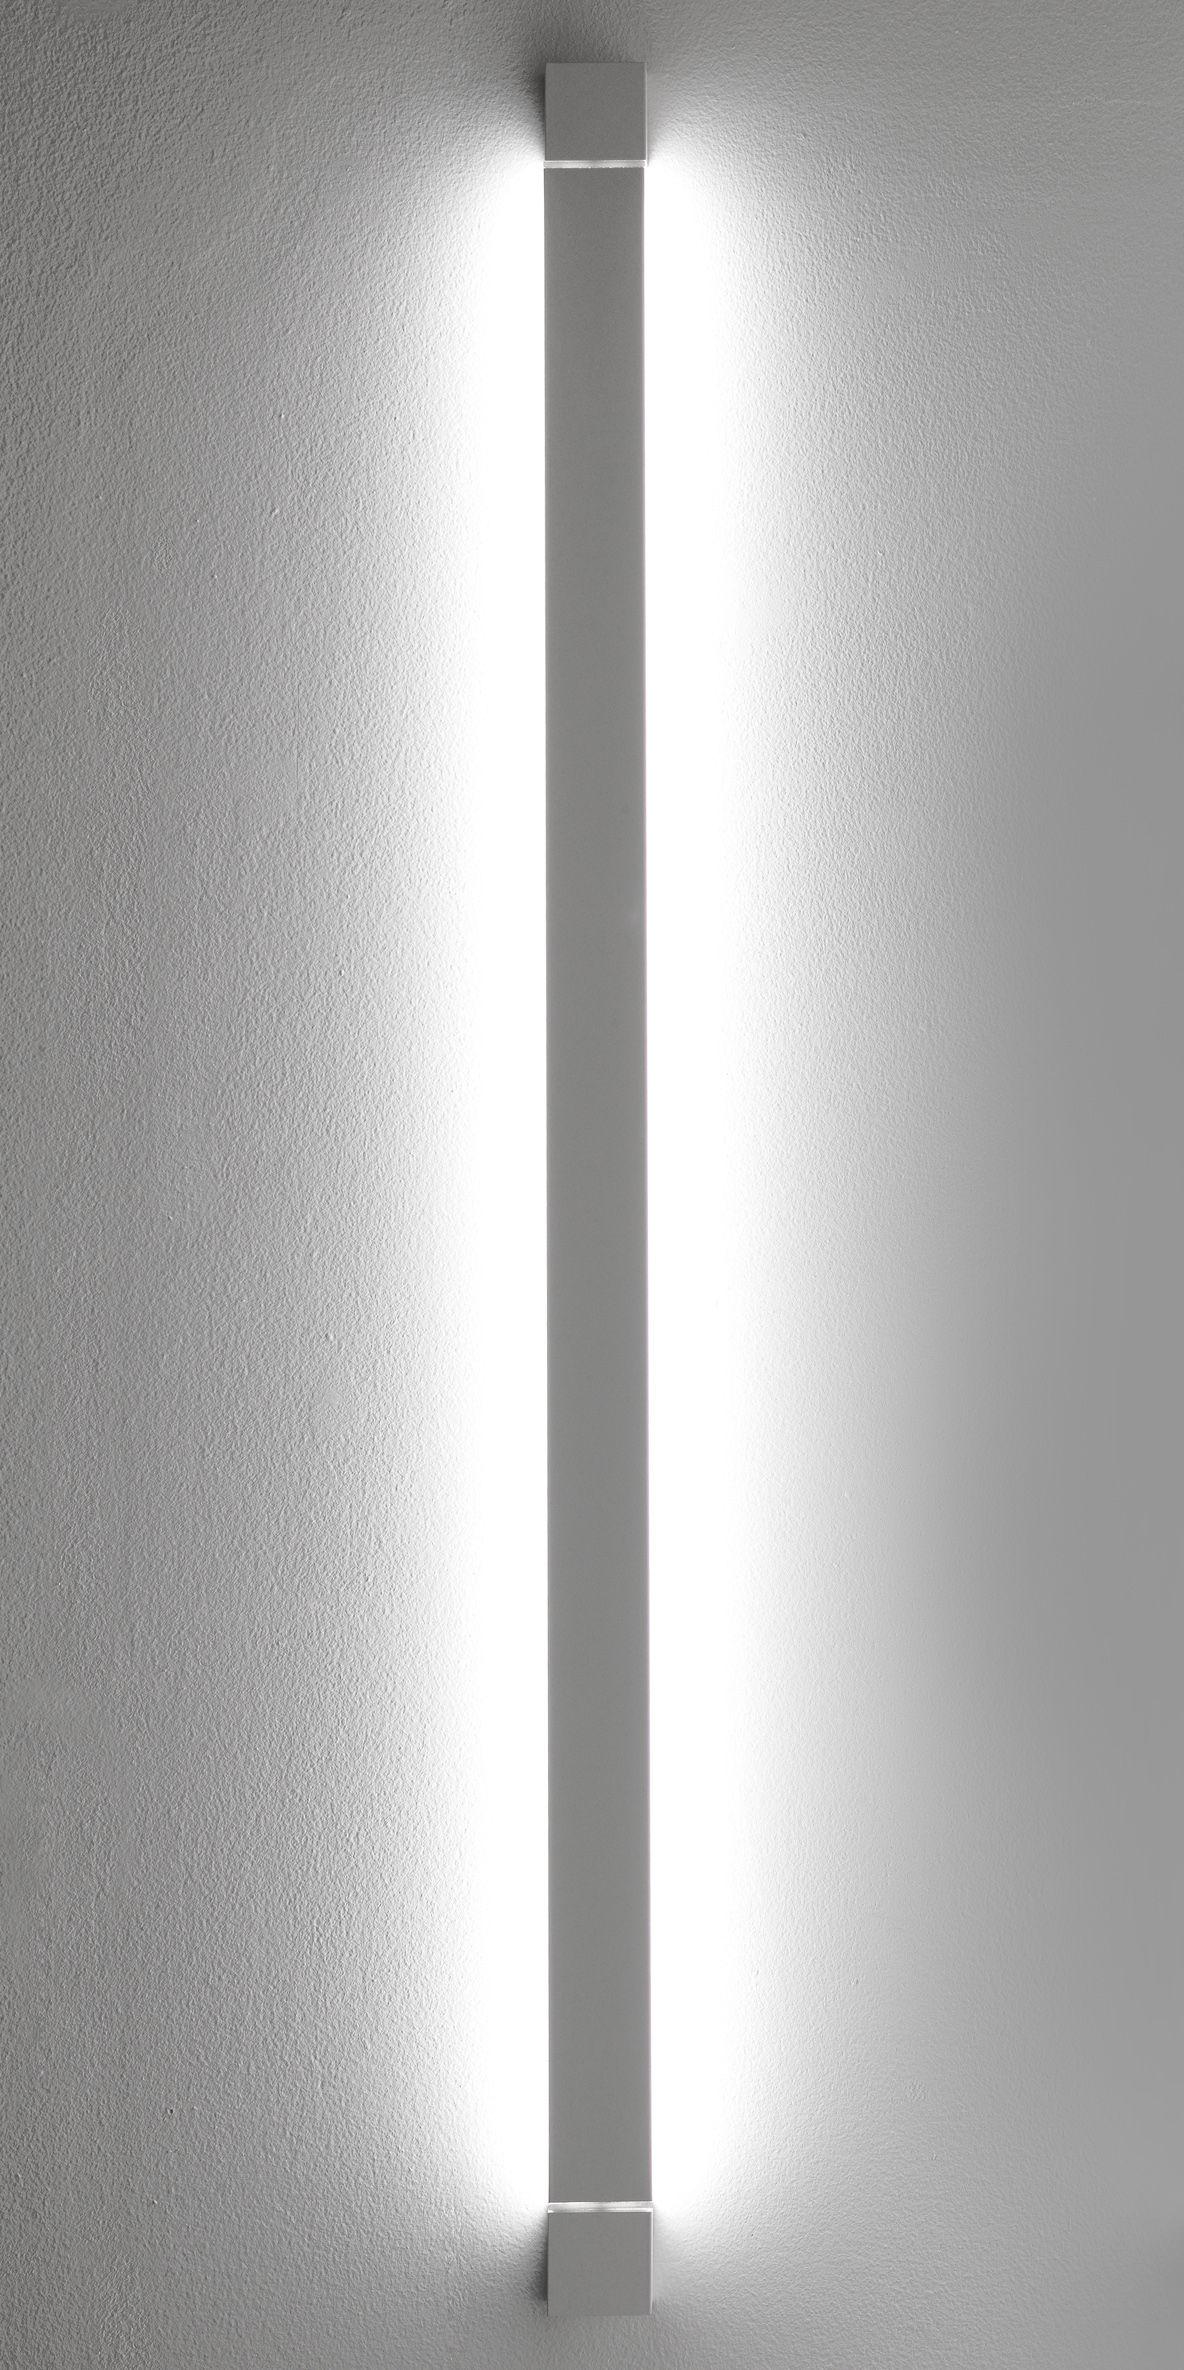 Lighting - Wall Lights - Pivot LED Wall light - L 112 cm by Fabbian - White - Painted aluminium